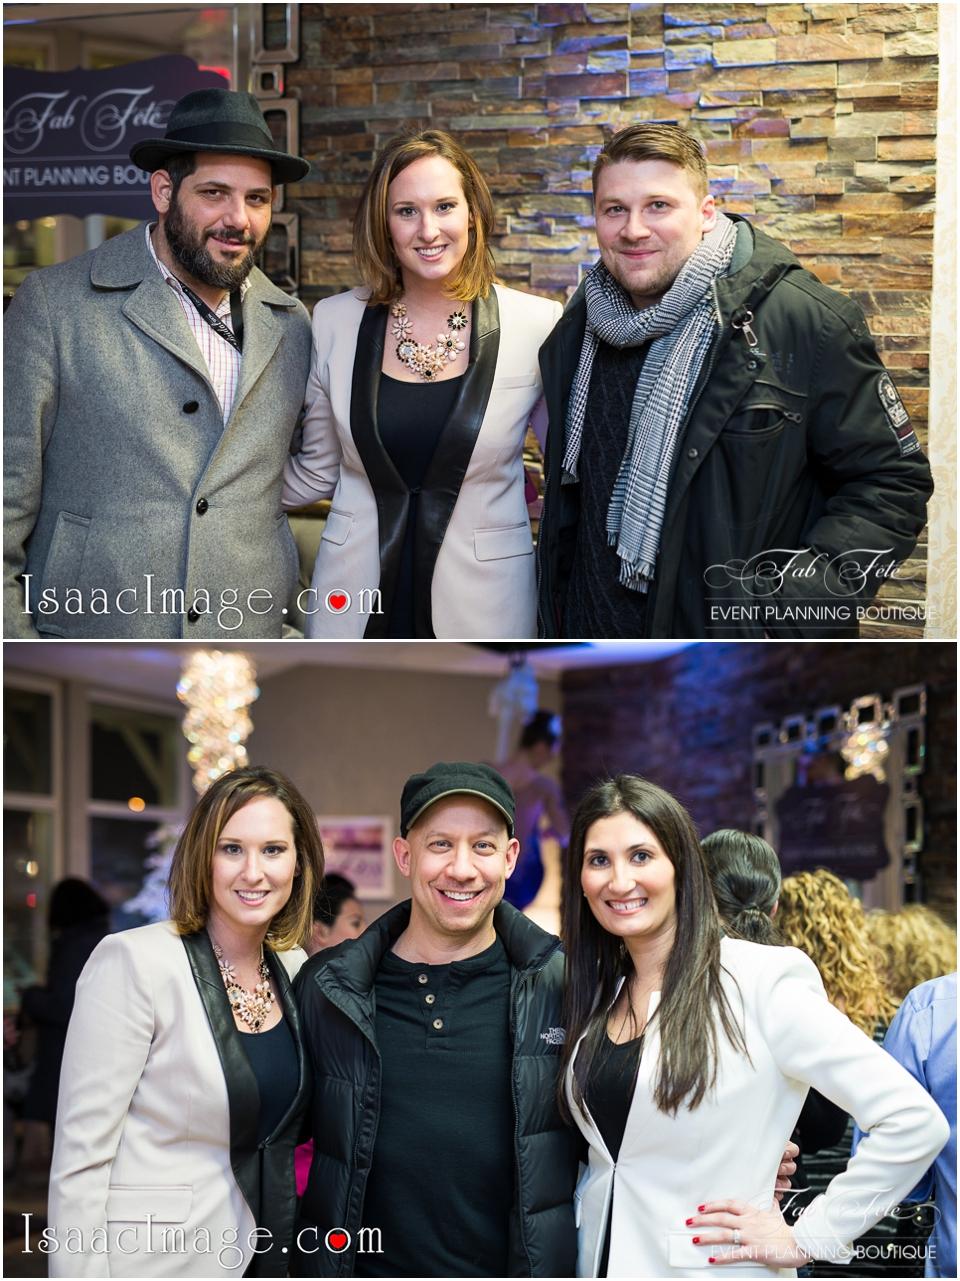 Fab Fete Toronto Wedding Event Planning Boutique open house_6485.jpg